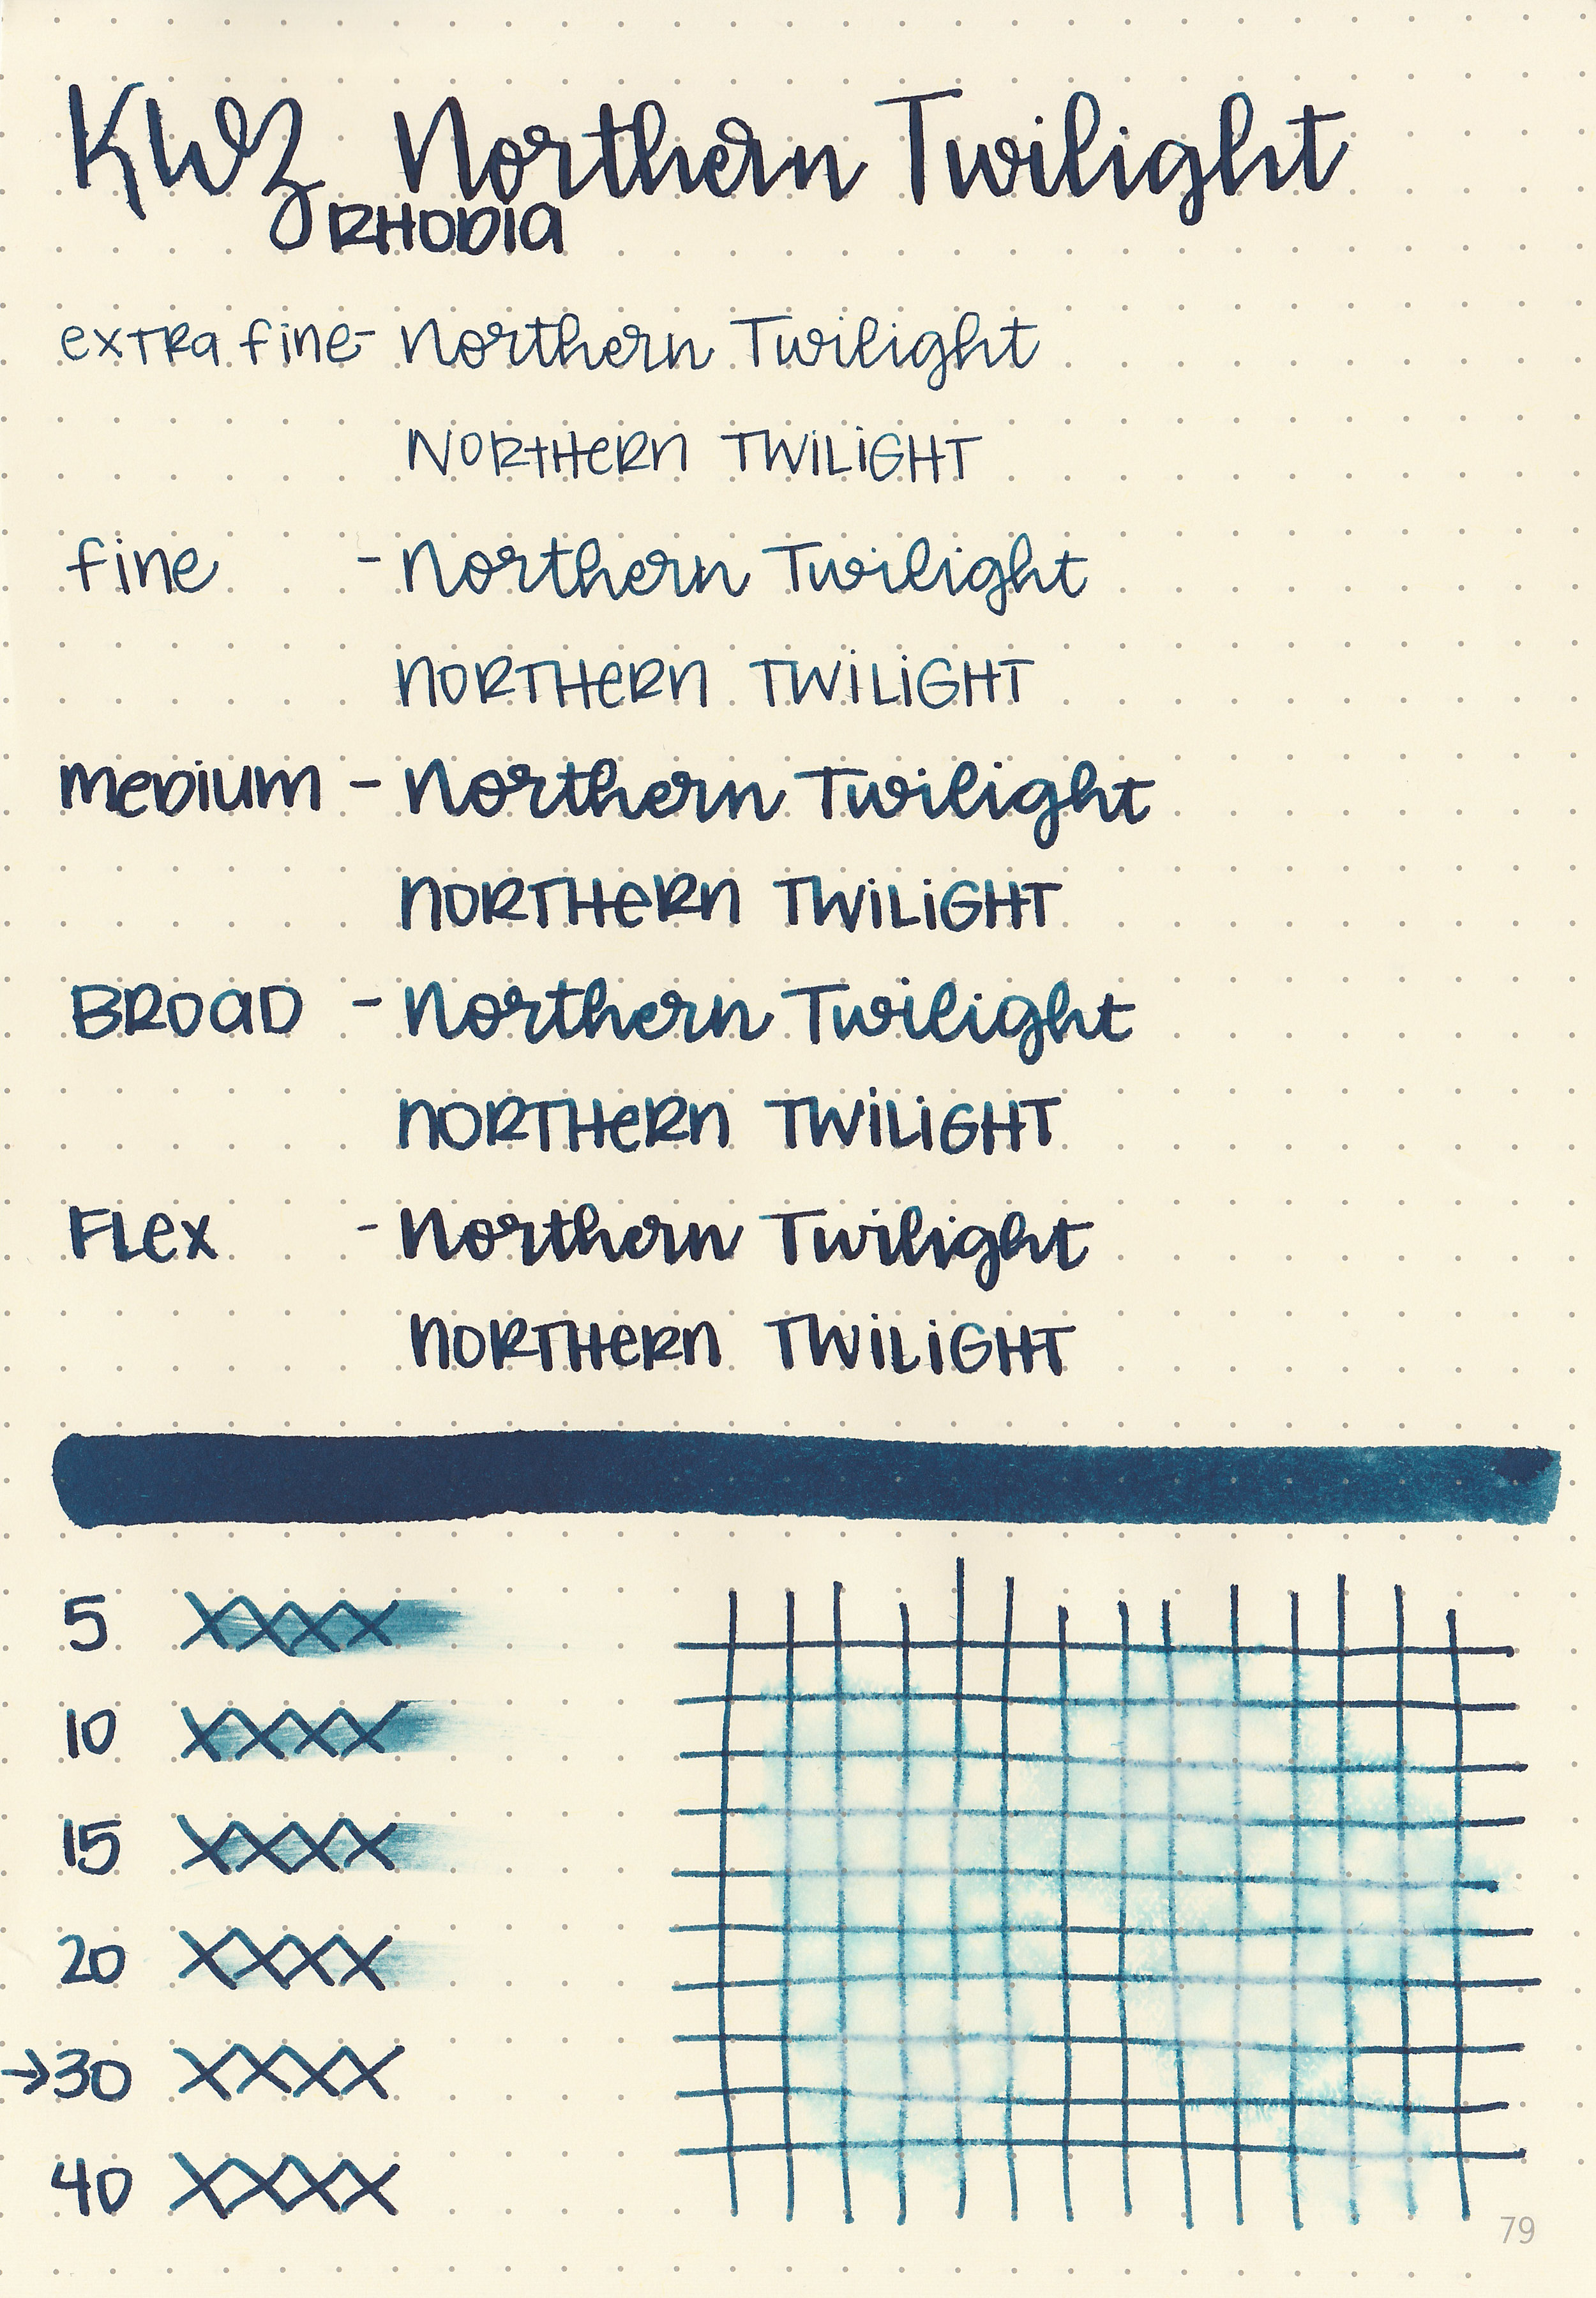 kwz-northern-twilight-3.jpg